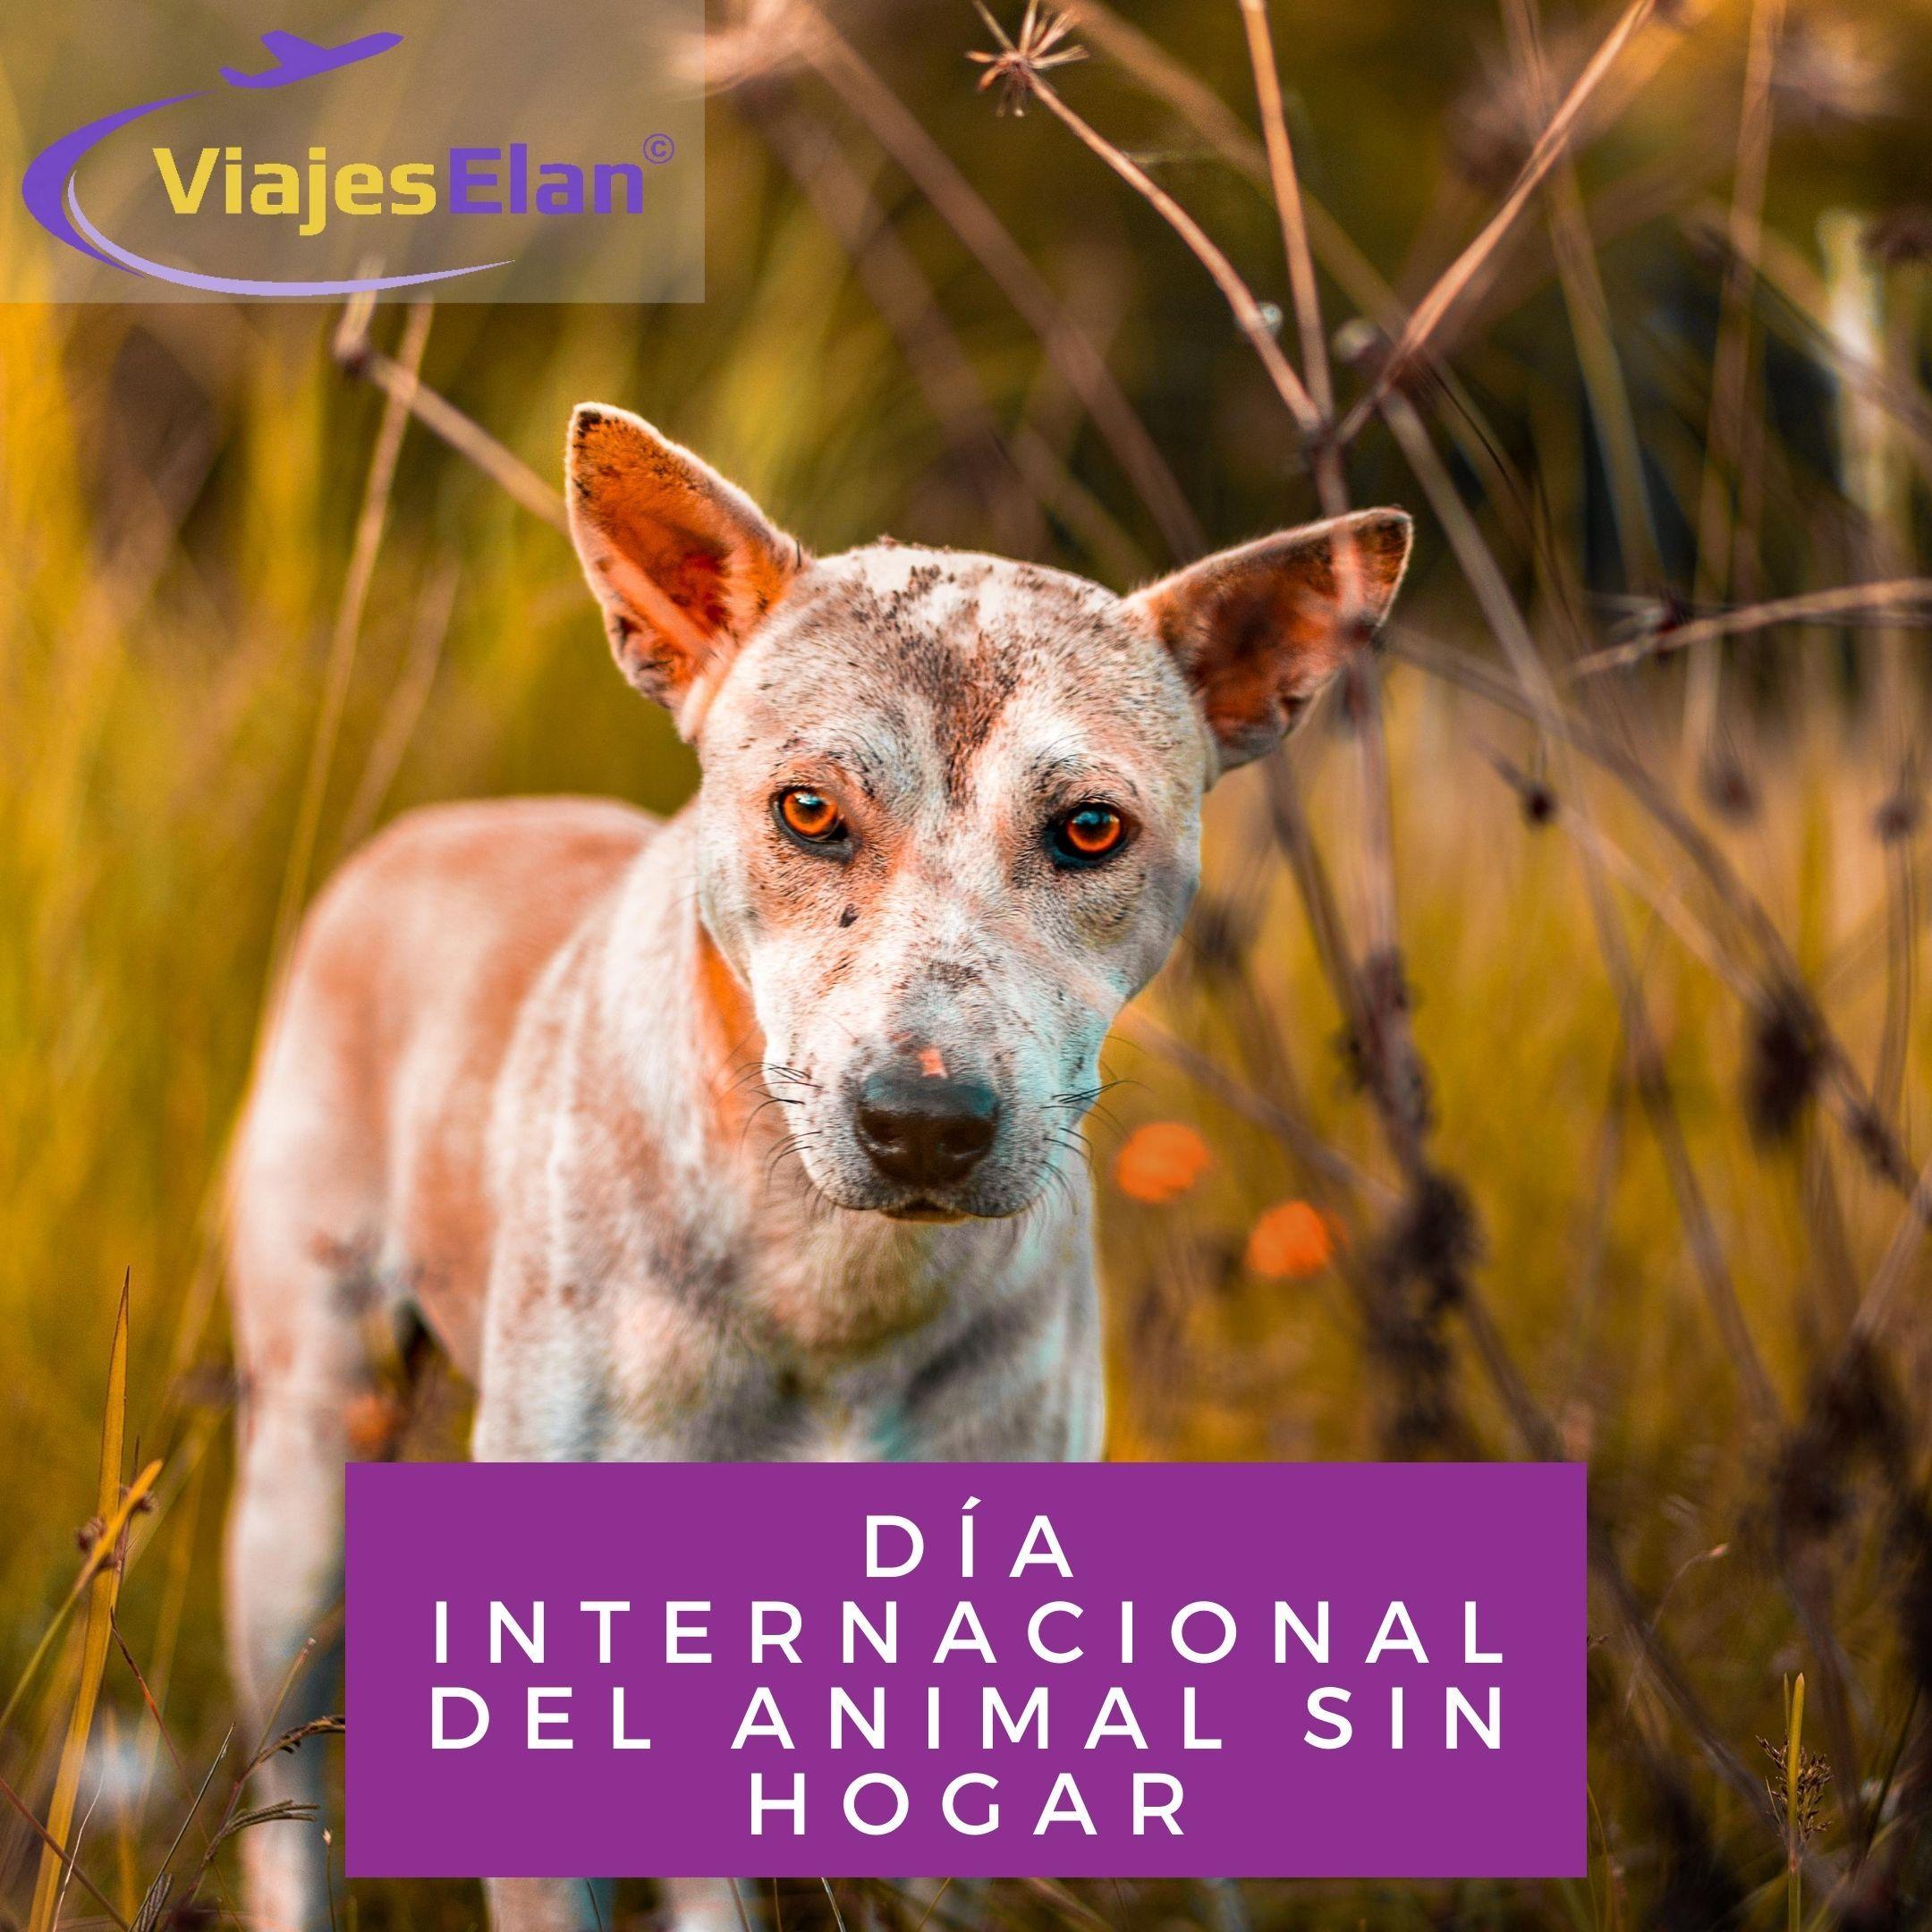 Día internacional animal sin hogar